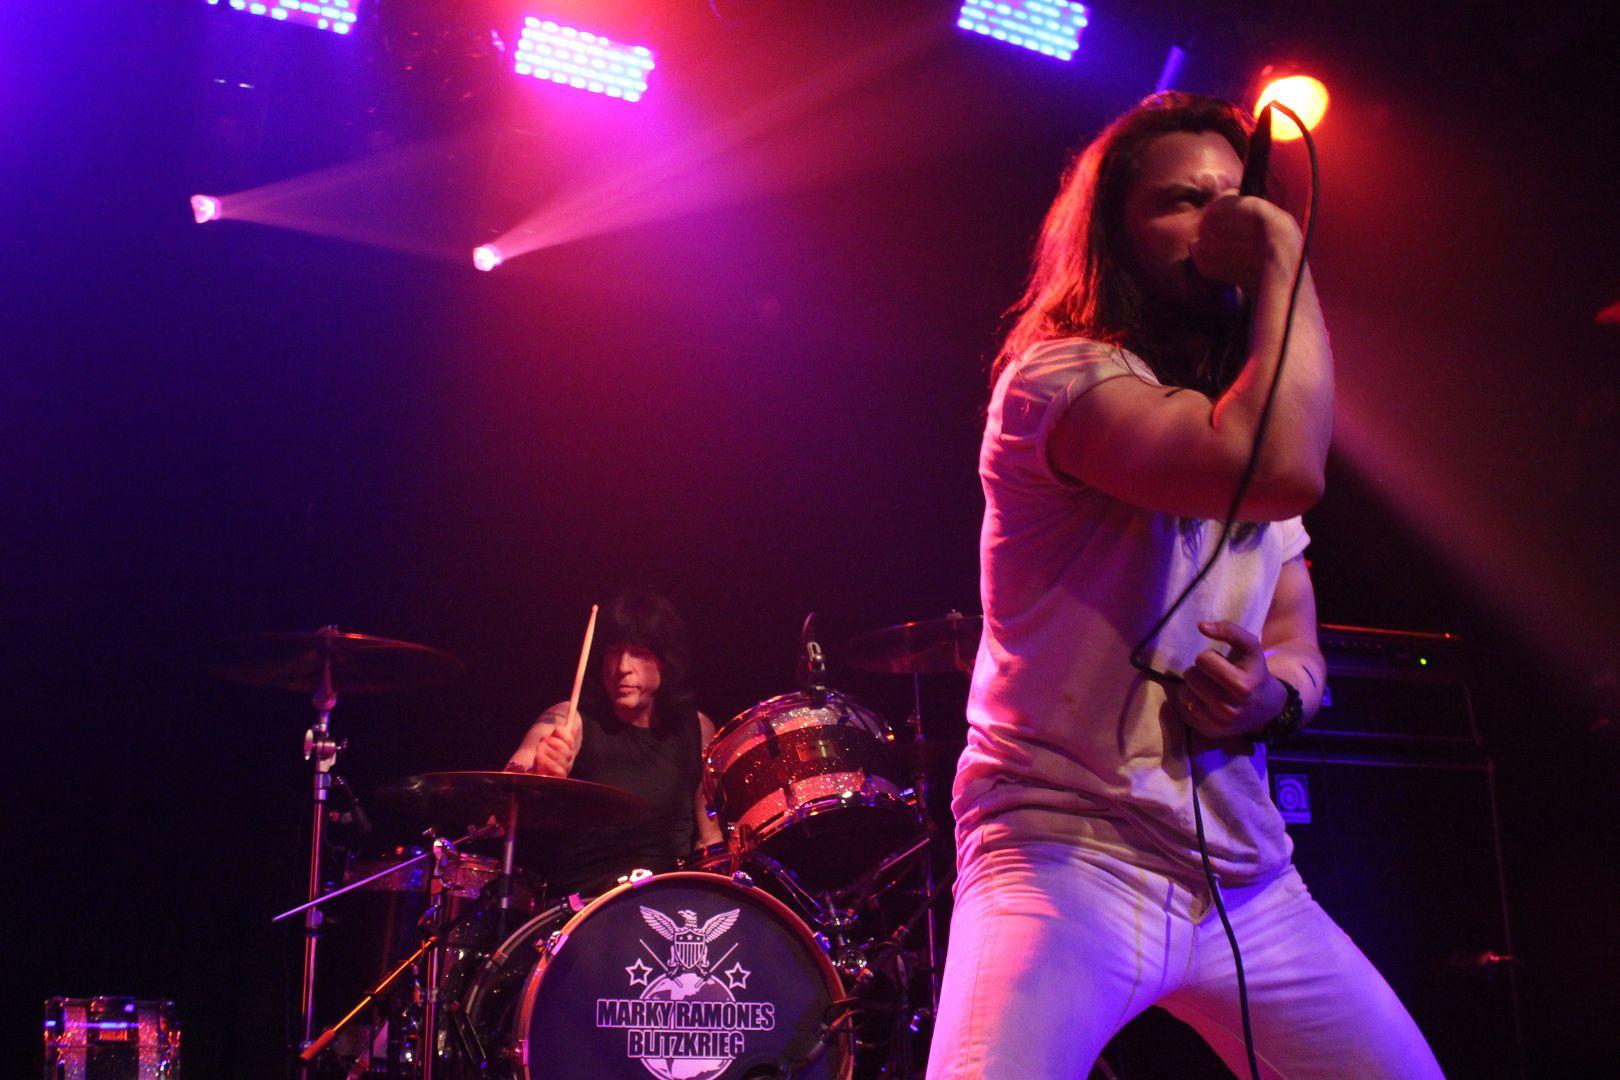 marky ramone vocalist tour 2017